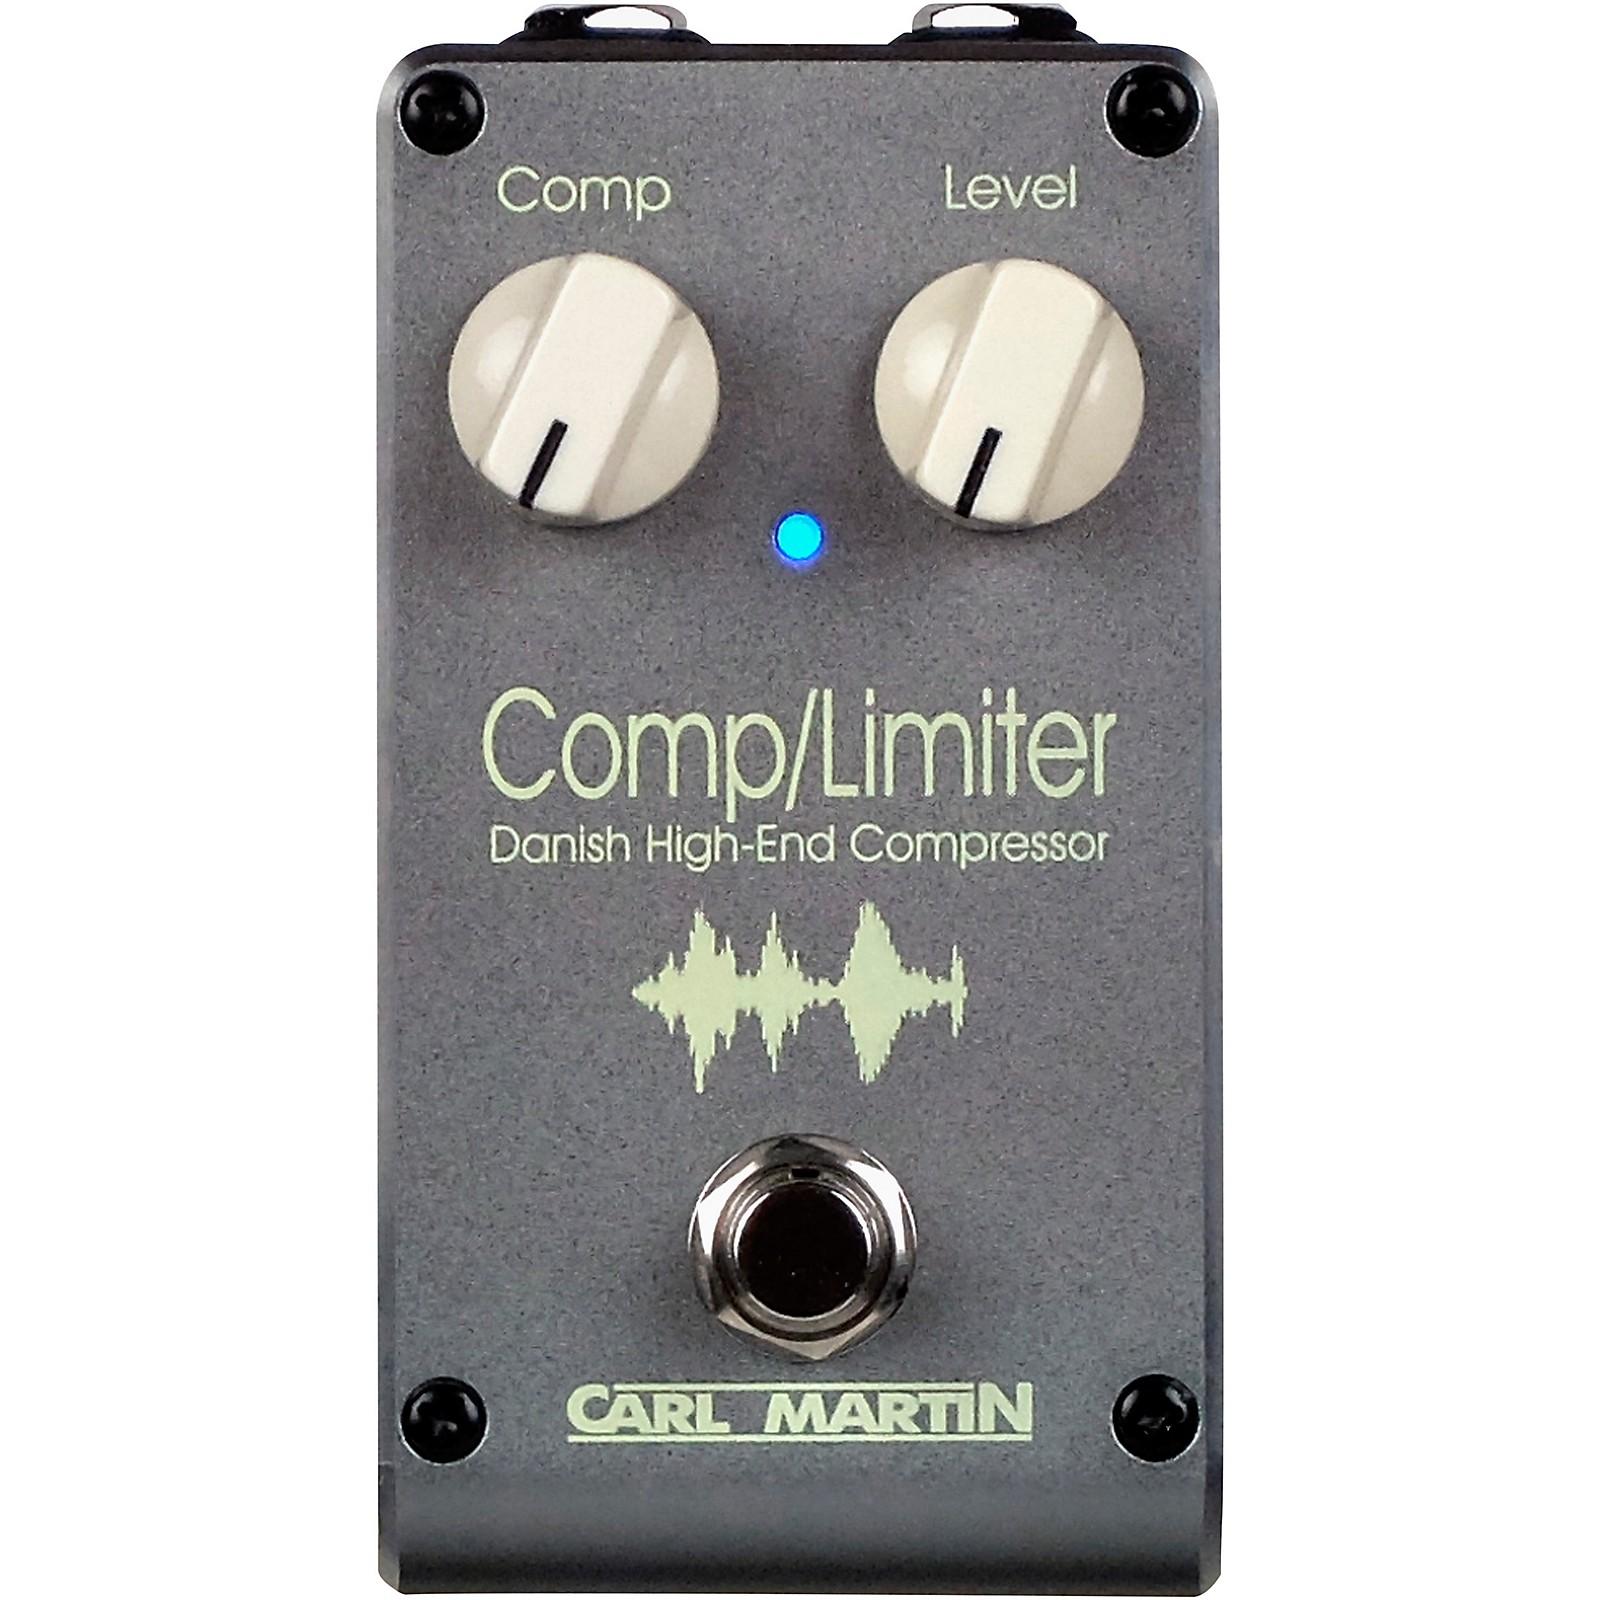 Carl Martin Comp Limiter Compressor Effects Pedal